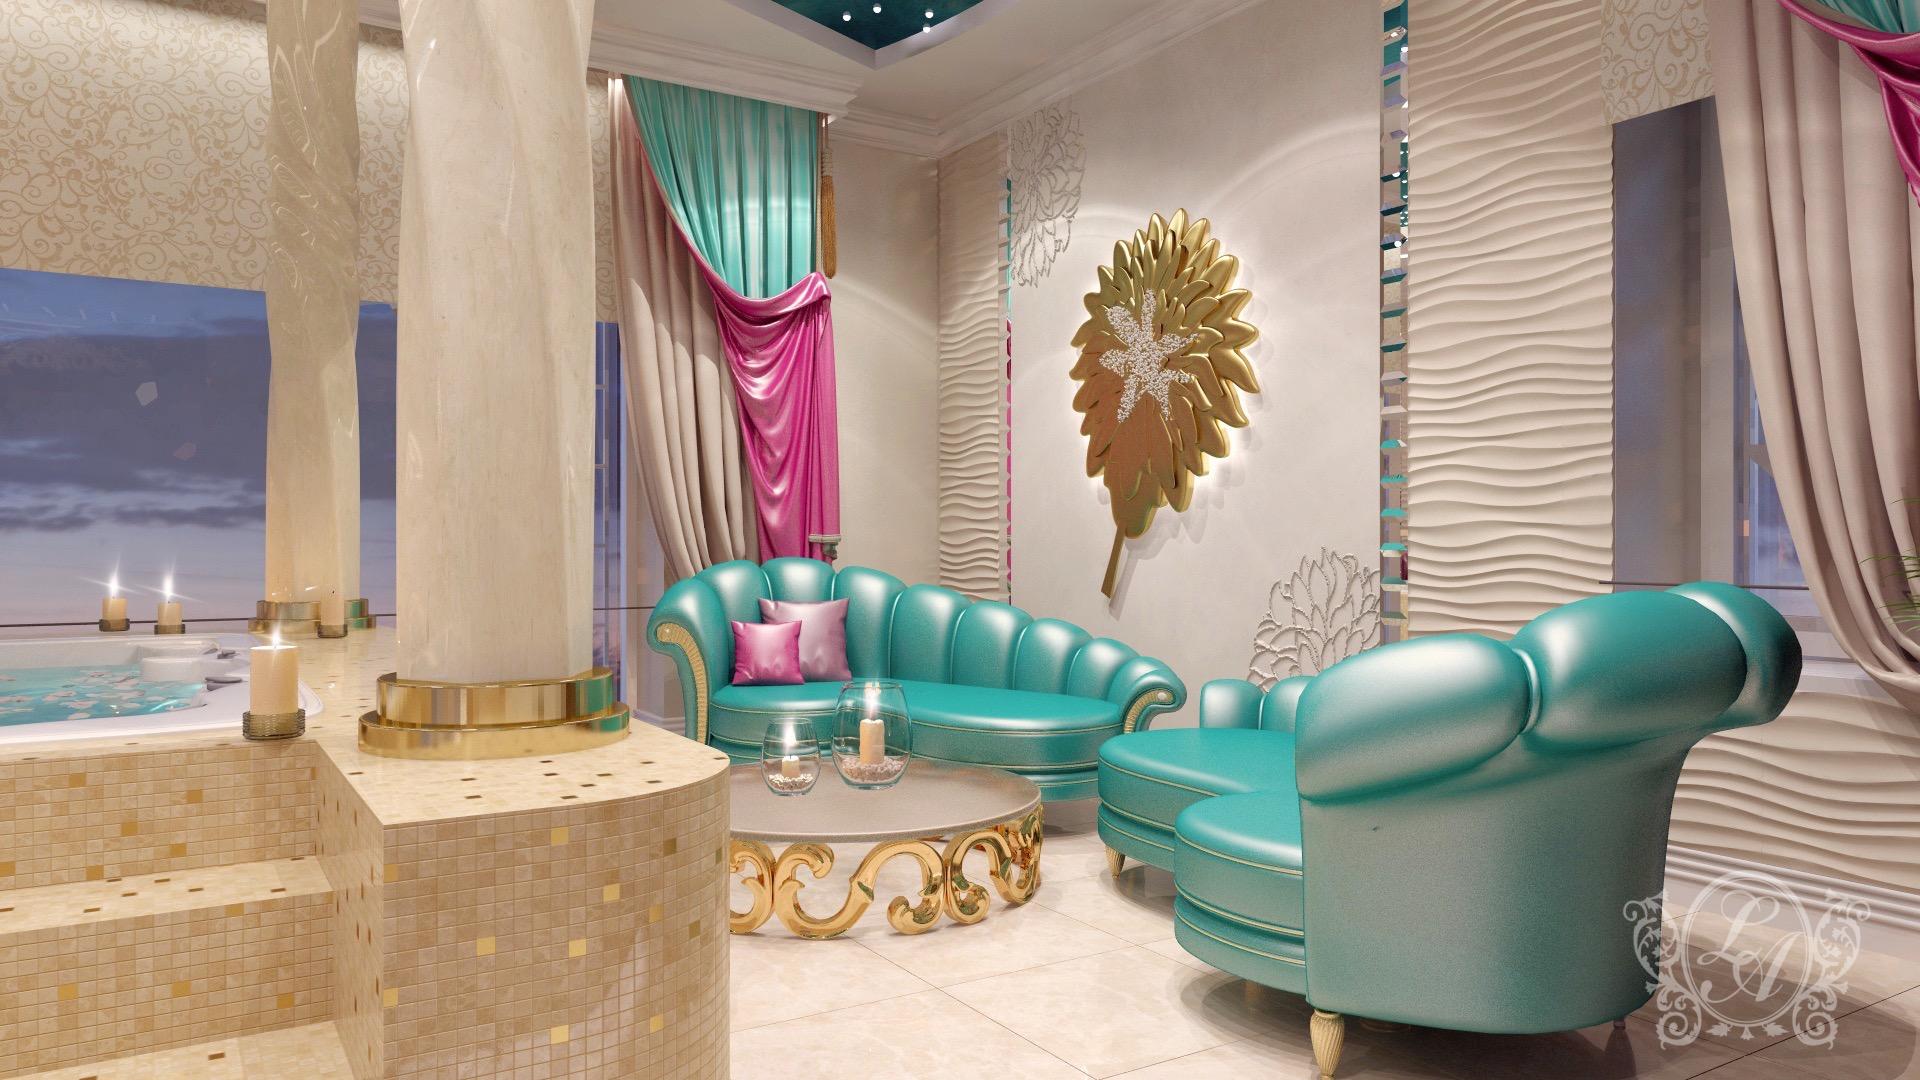 luxurious_private_spa_02.jpg